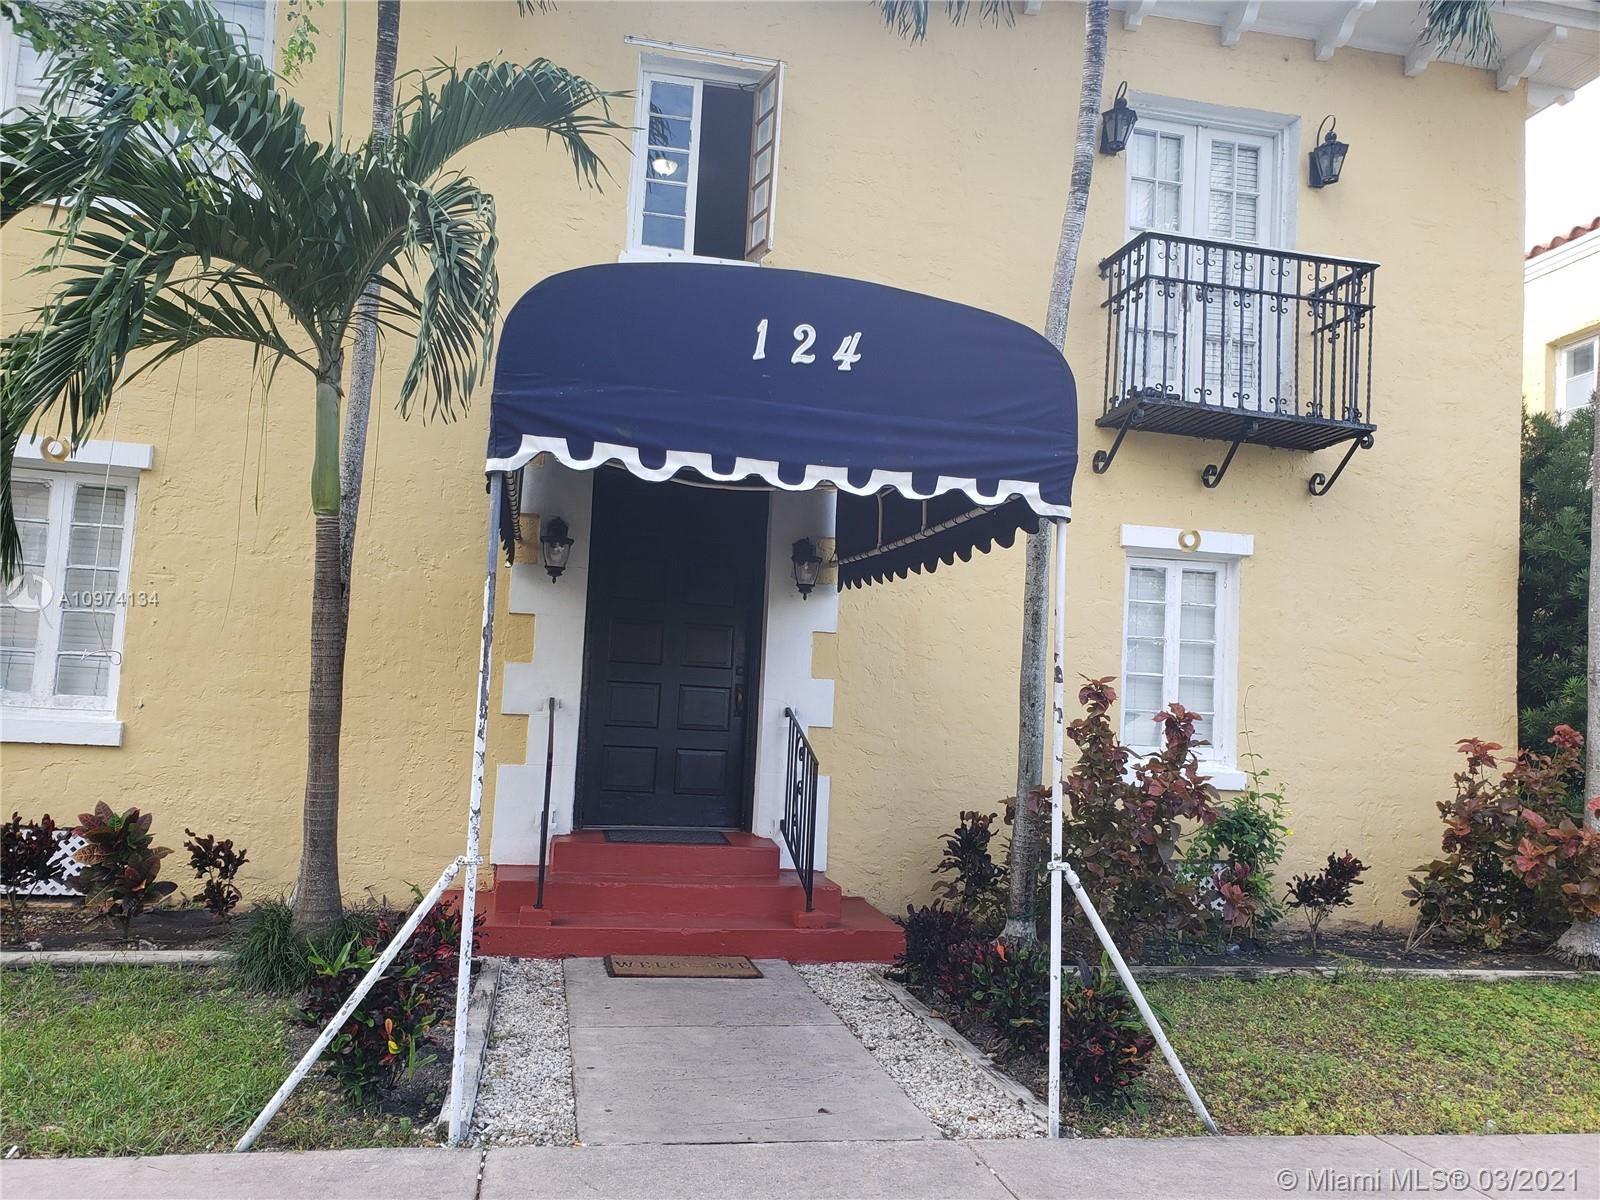 124 Mendoza Ave #9, Coral Gables, FL 33134 - #: A10974134